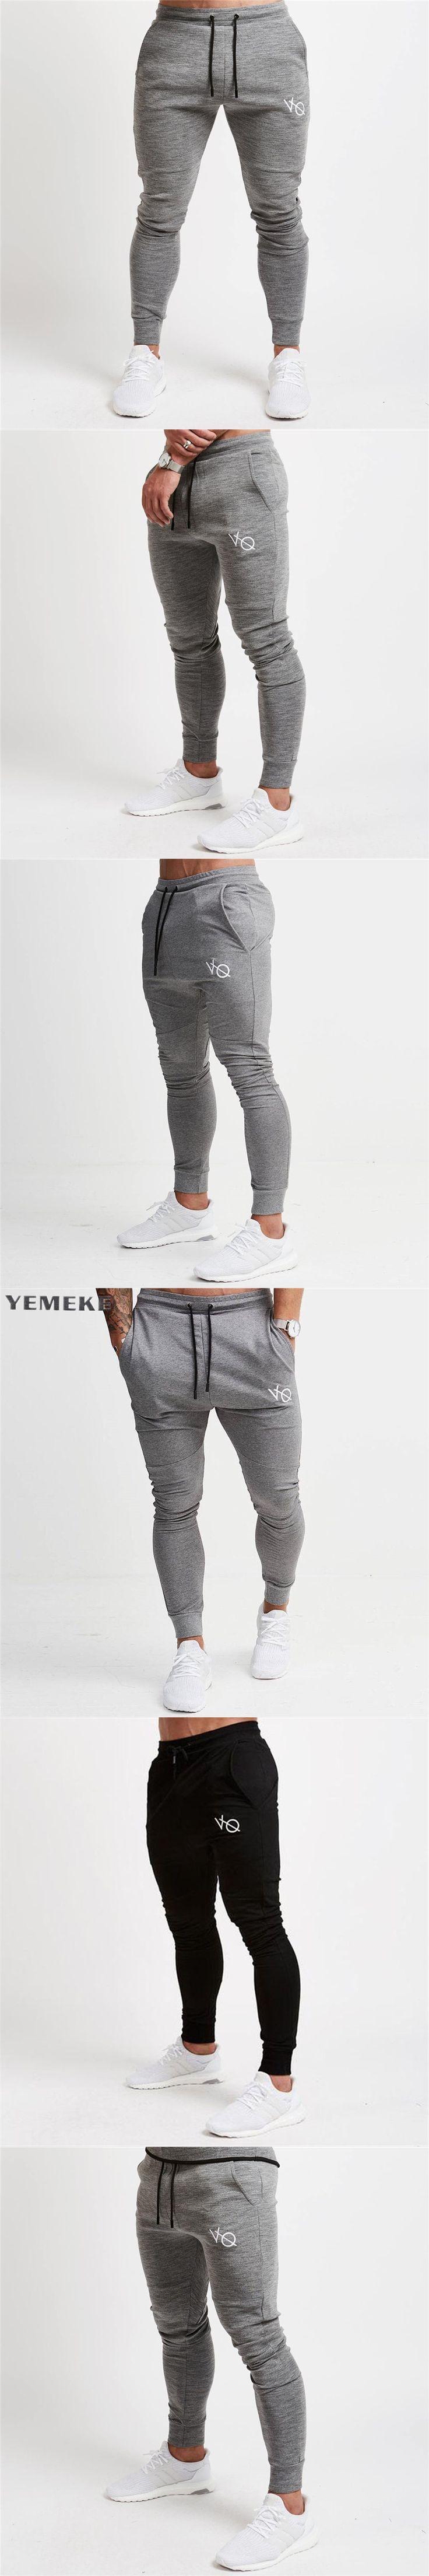 YEMEKE 2017 Autumn New Men's Fitness Sweatpants Pants Male Bodybuilding Casual Elastic Cotton Brand Trousers Joggers Pants